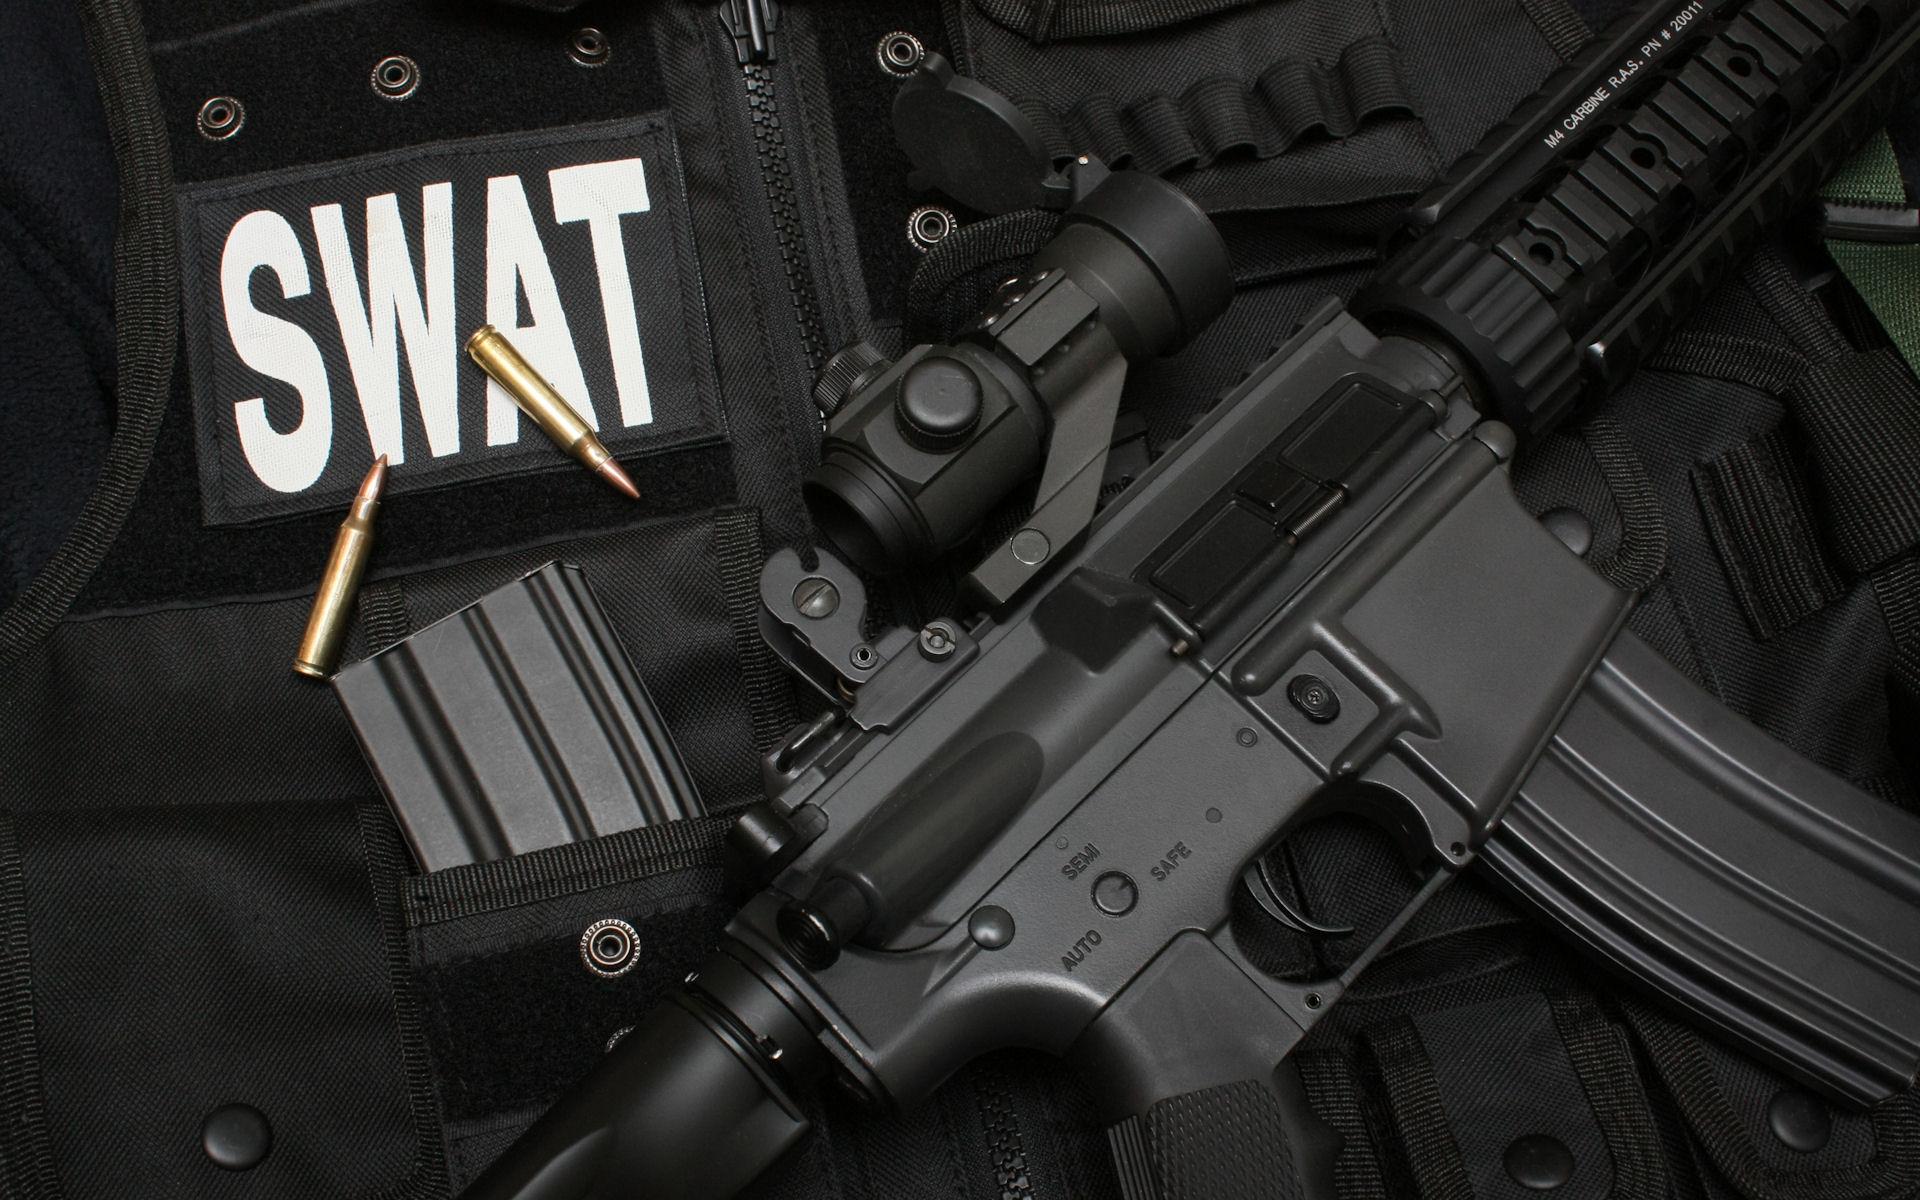 Armas y SWAT hd 1920x1200   imagenes   wallpapers gratis   Variados 1920x1200